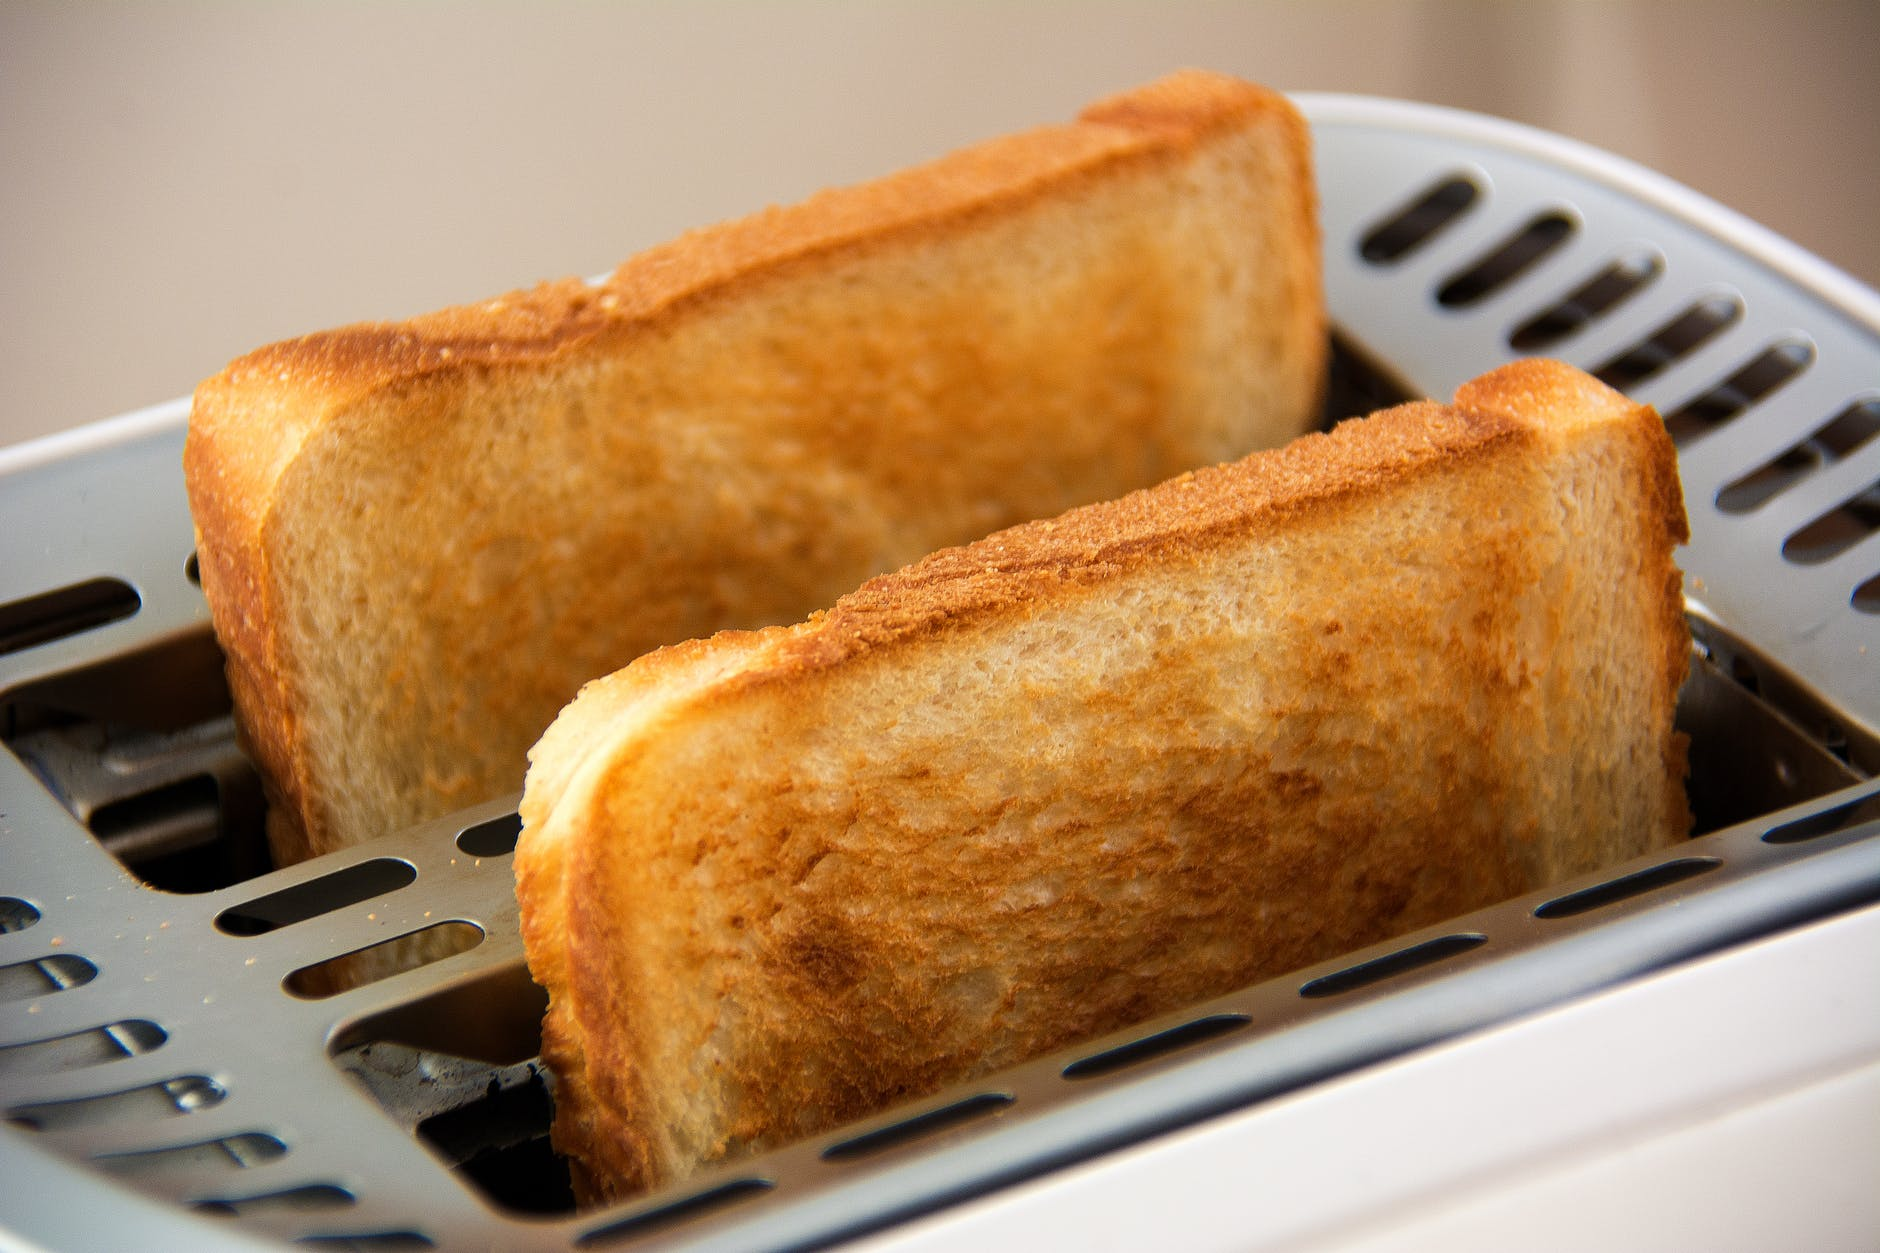 Toasted Bread - Tech Strange